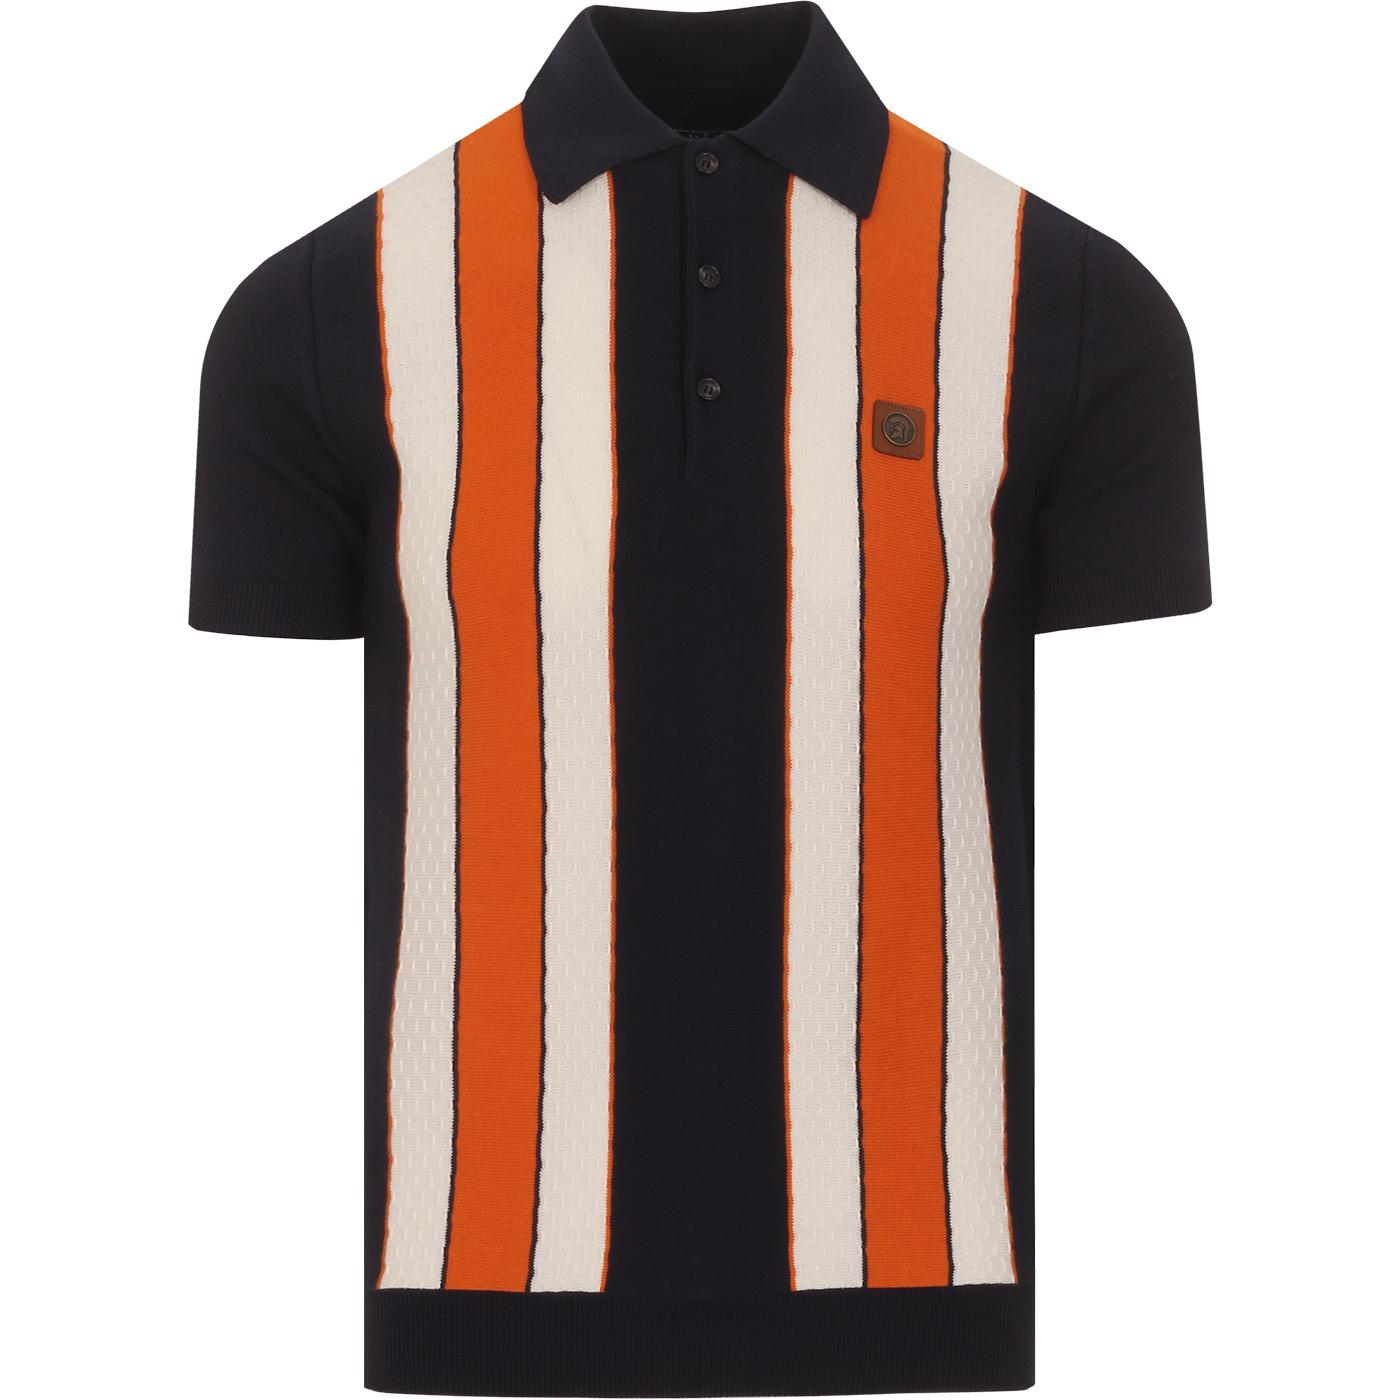 TROJAN RECORDS 60s Mod Dobby Stripe Knit Polo (N)